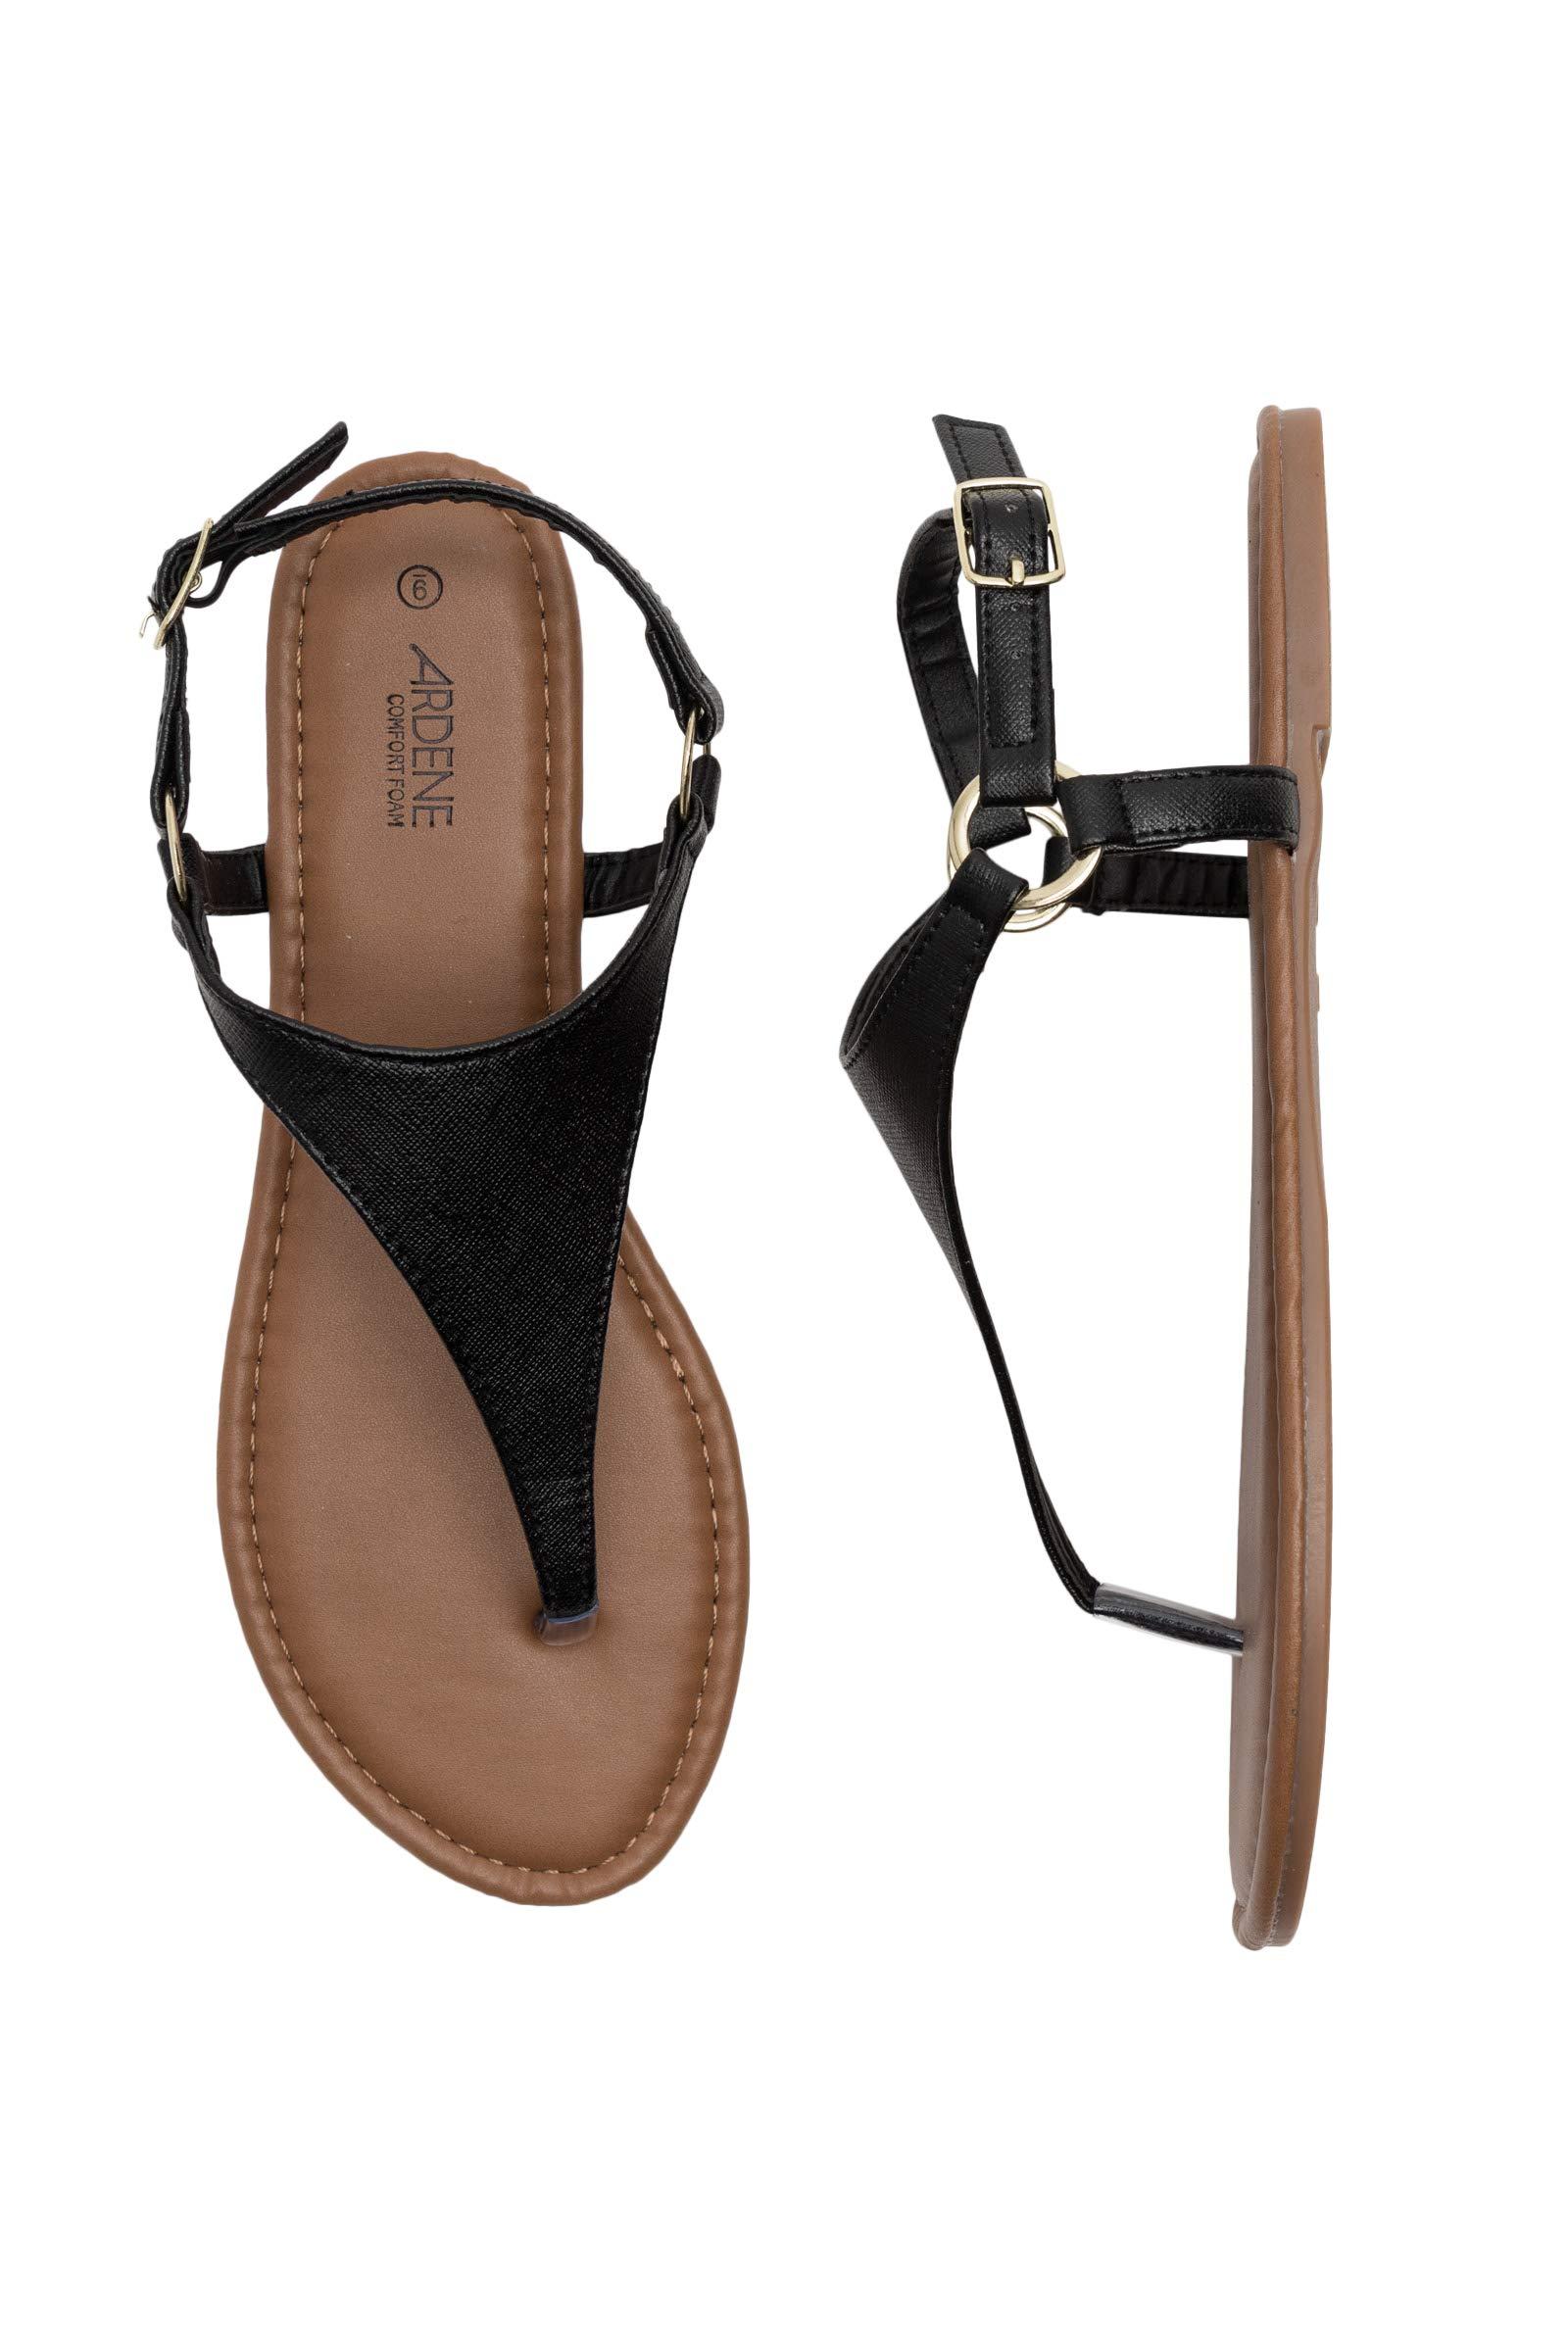 43724edff56 Ardene - Women s - T-Strap Sandals - T-Strap Sandals 10 -(8A-FW01535)